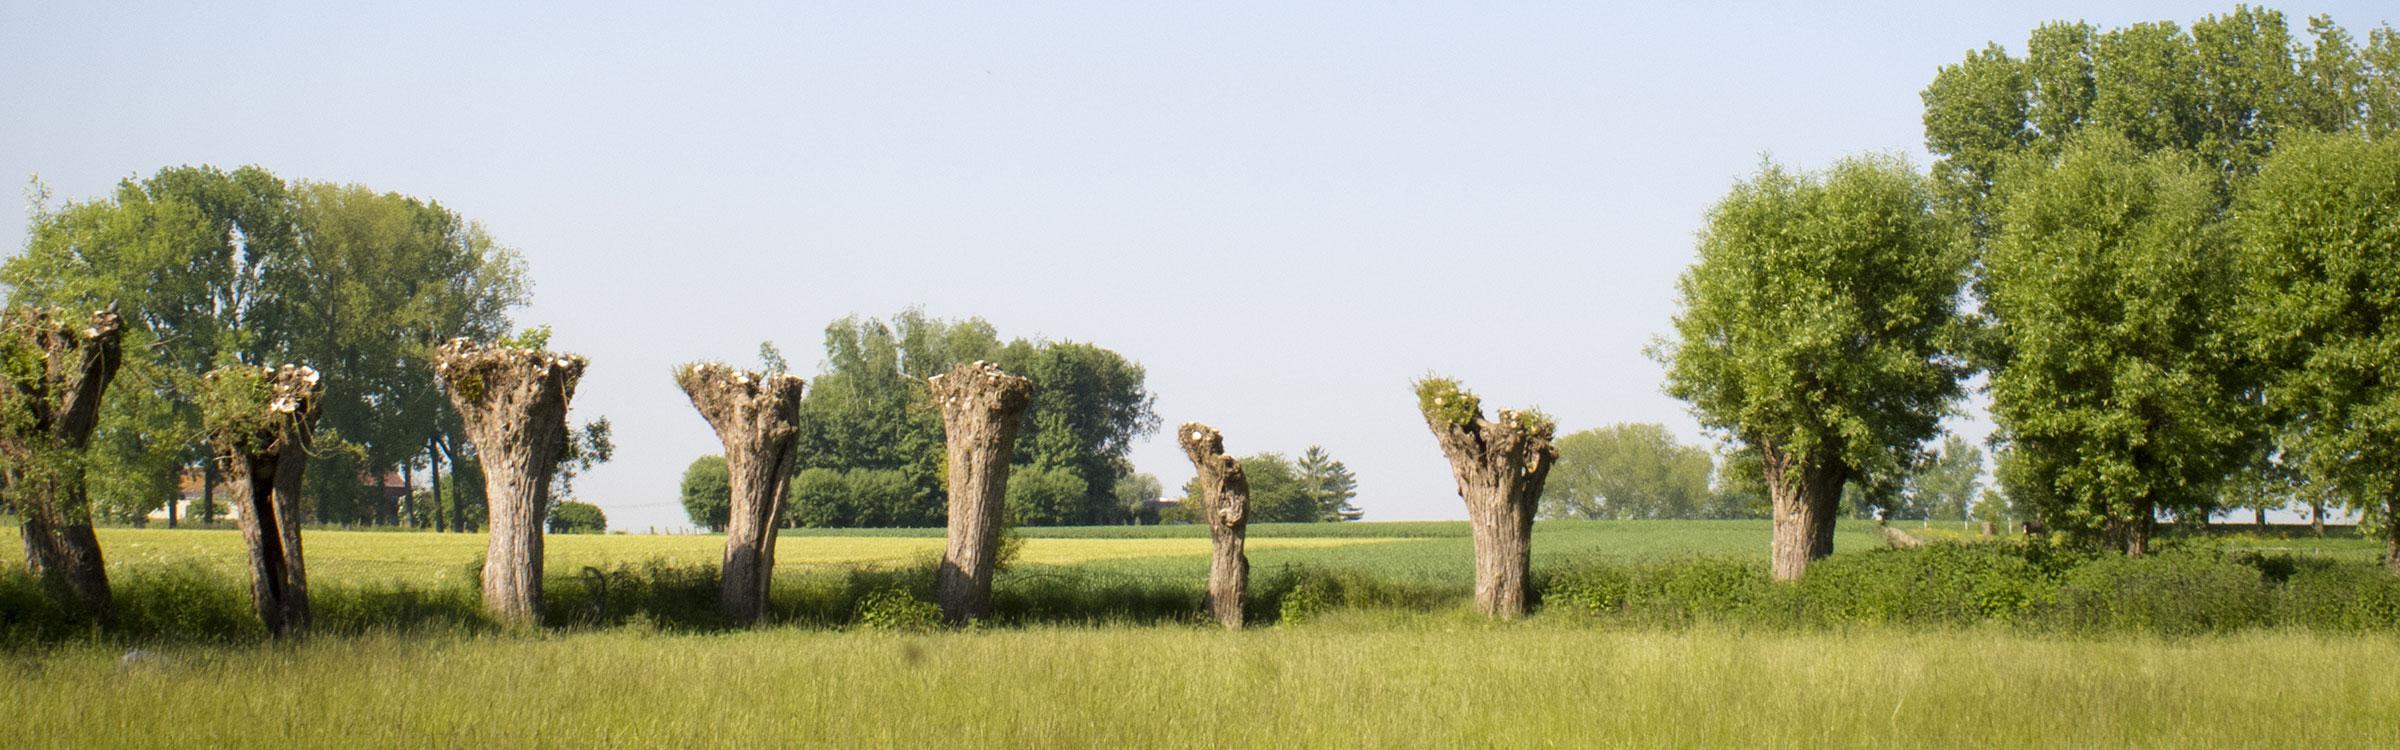 Platteland algemeen